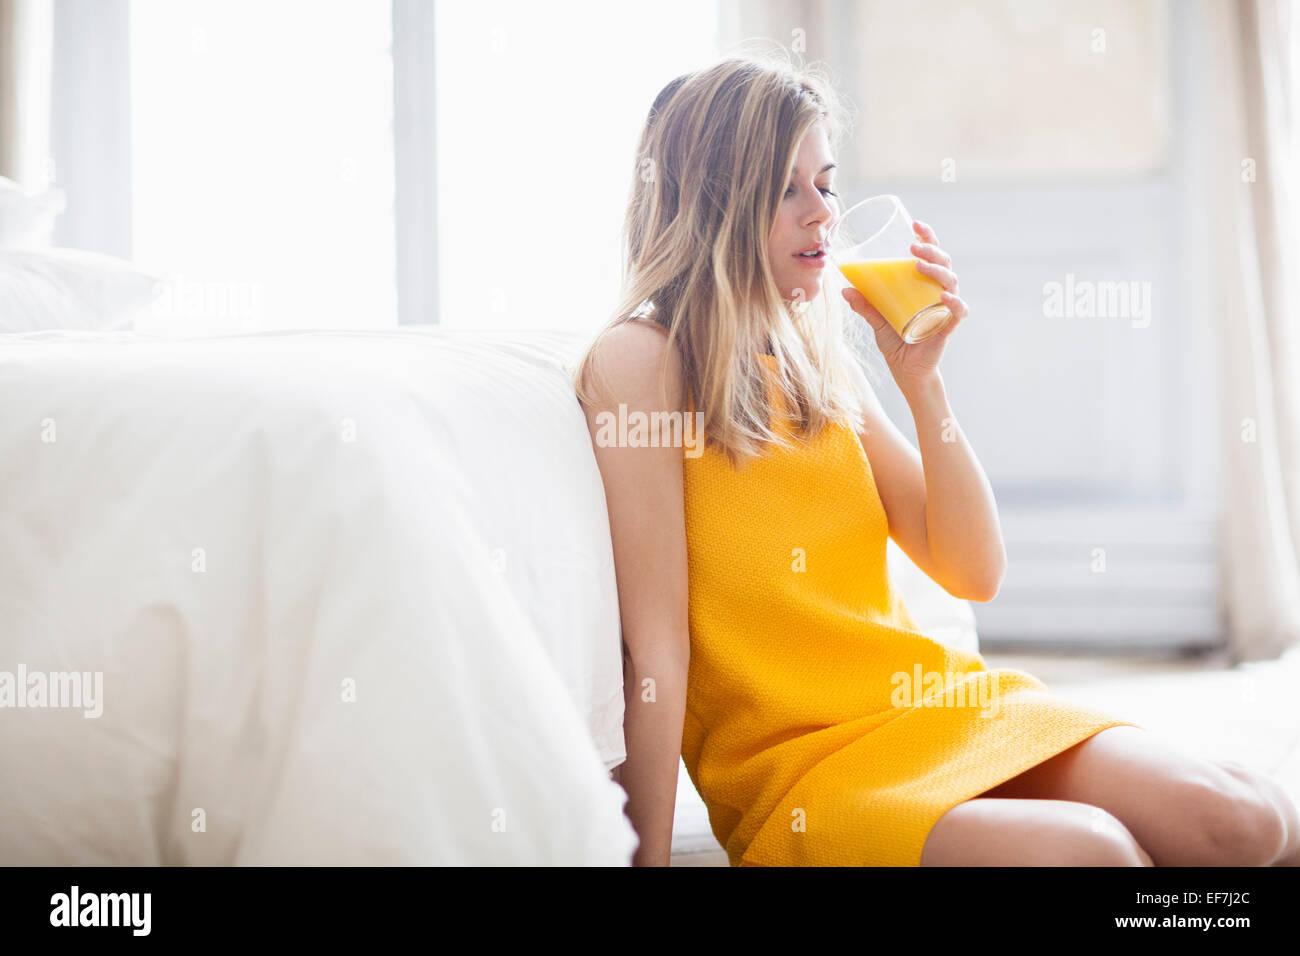 Woman drinking orange juice Photo Stock